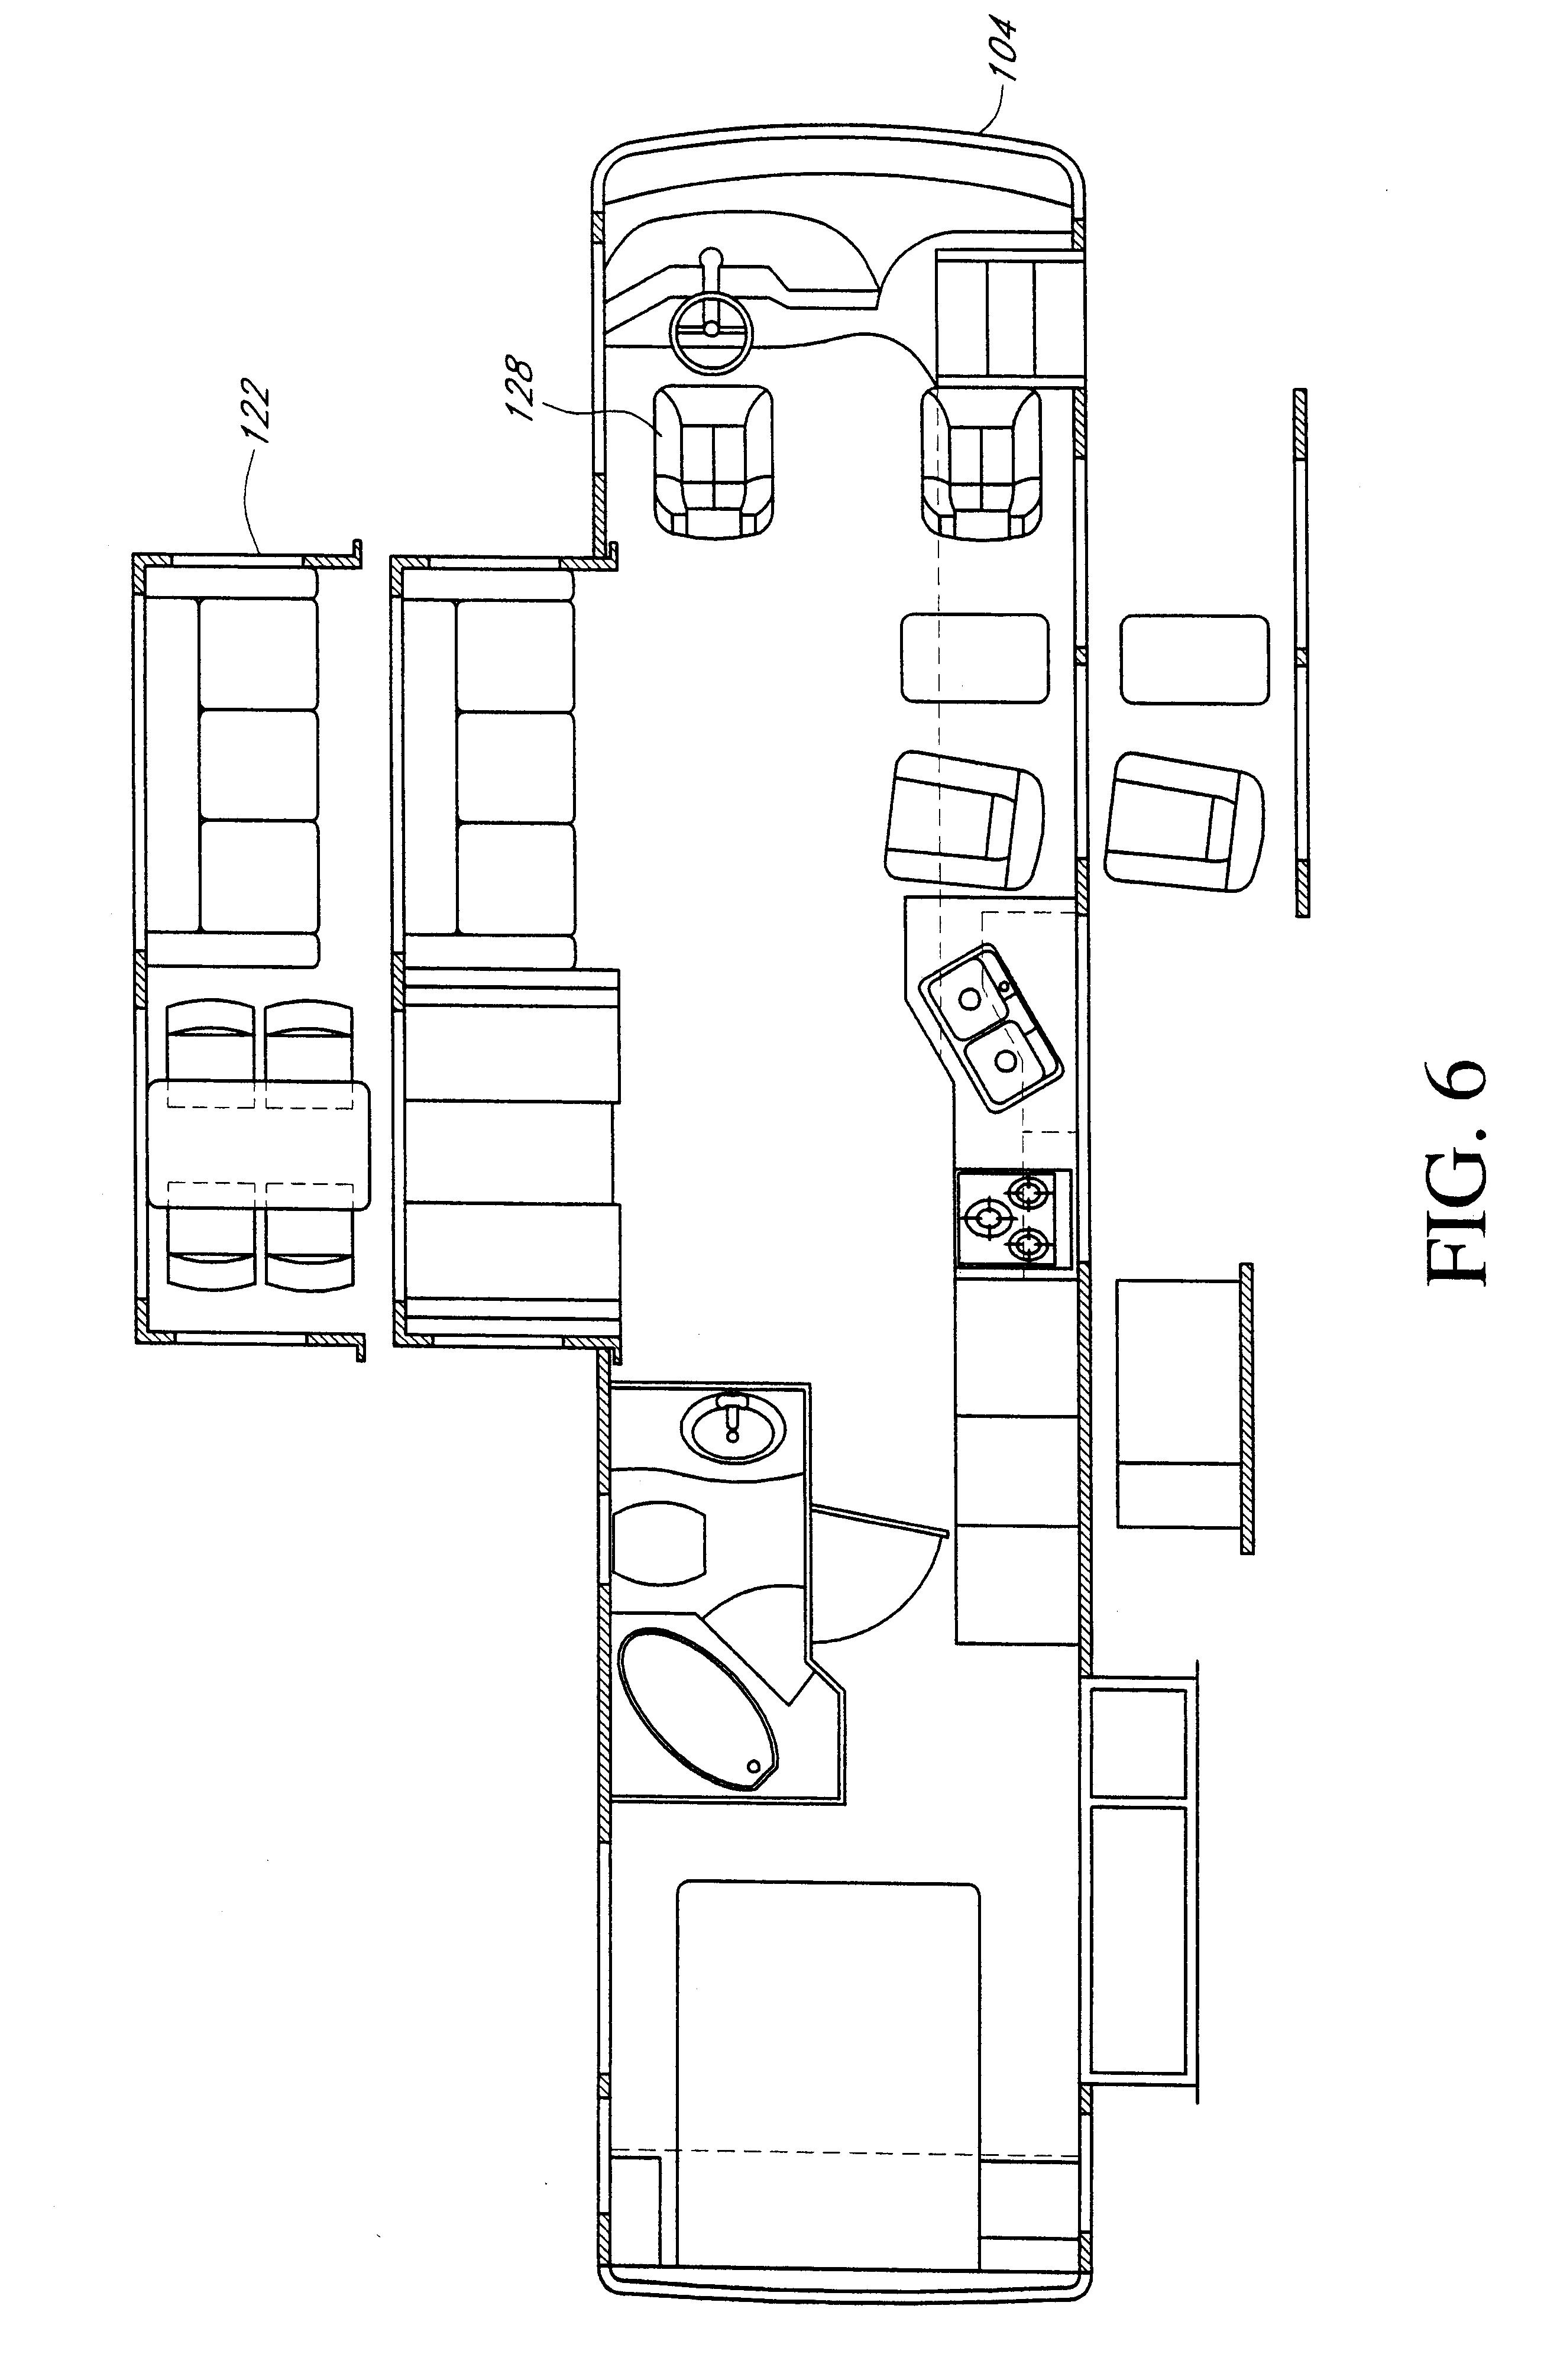 Image Result For Motorhome Ceiling